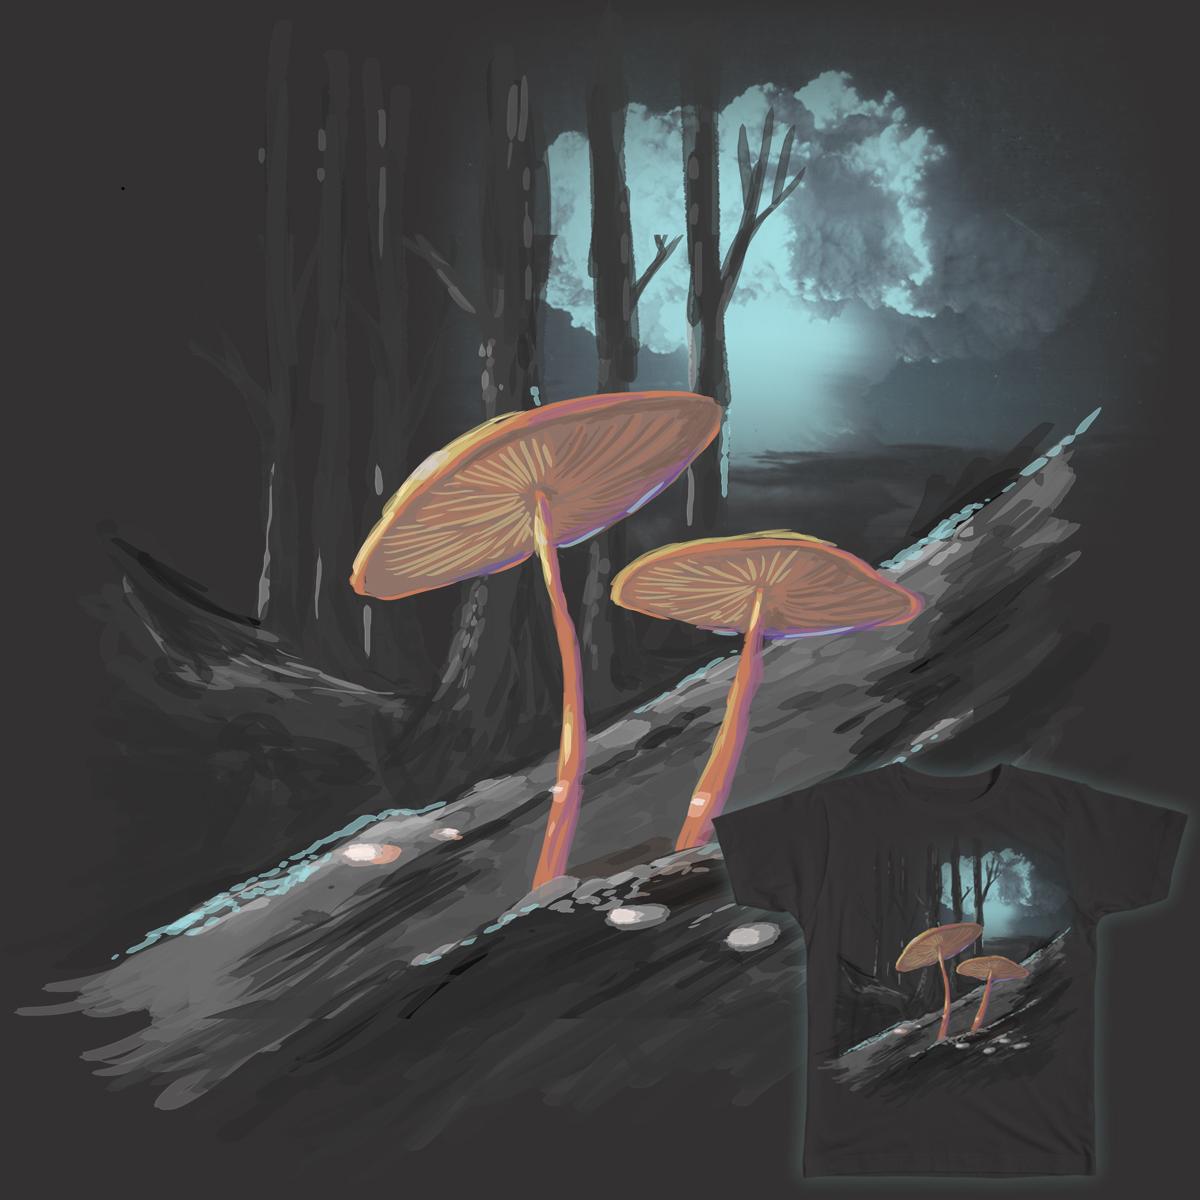 Mushroom Cloud by chapstickninja on Threadless